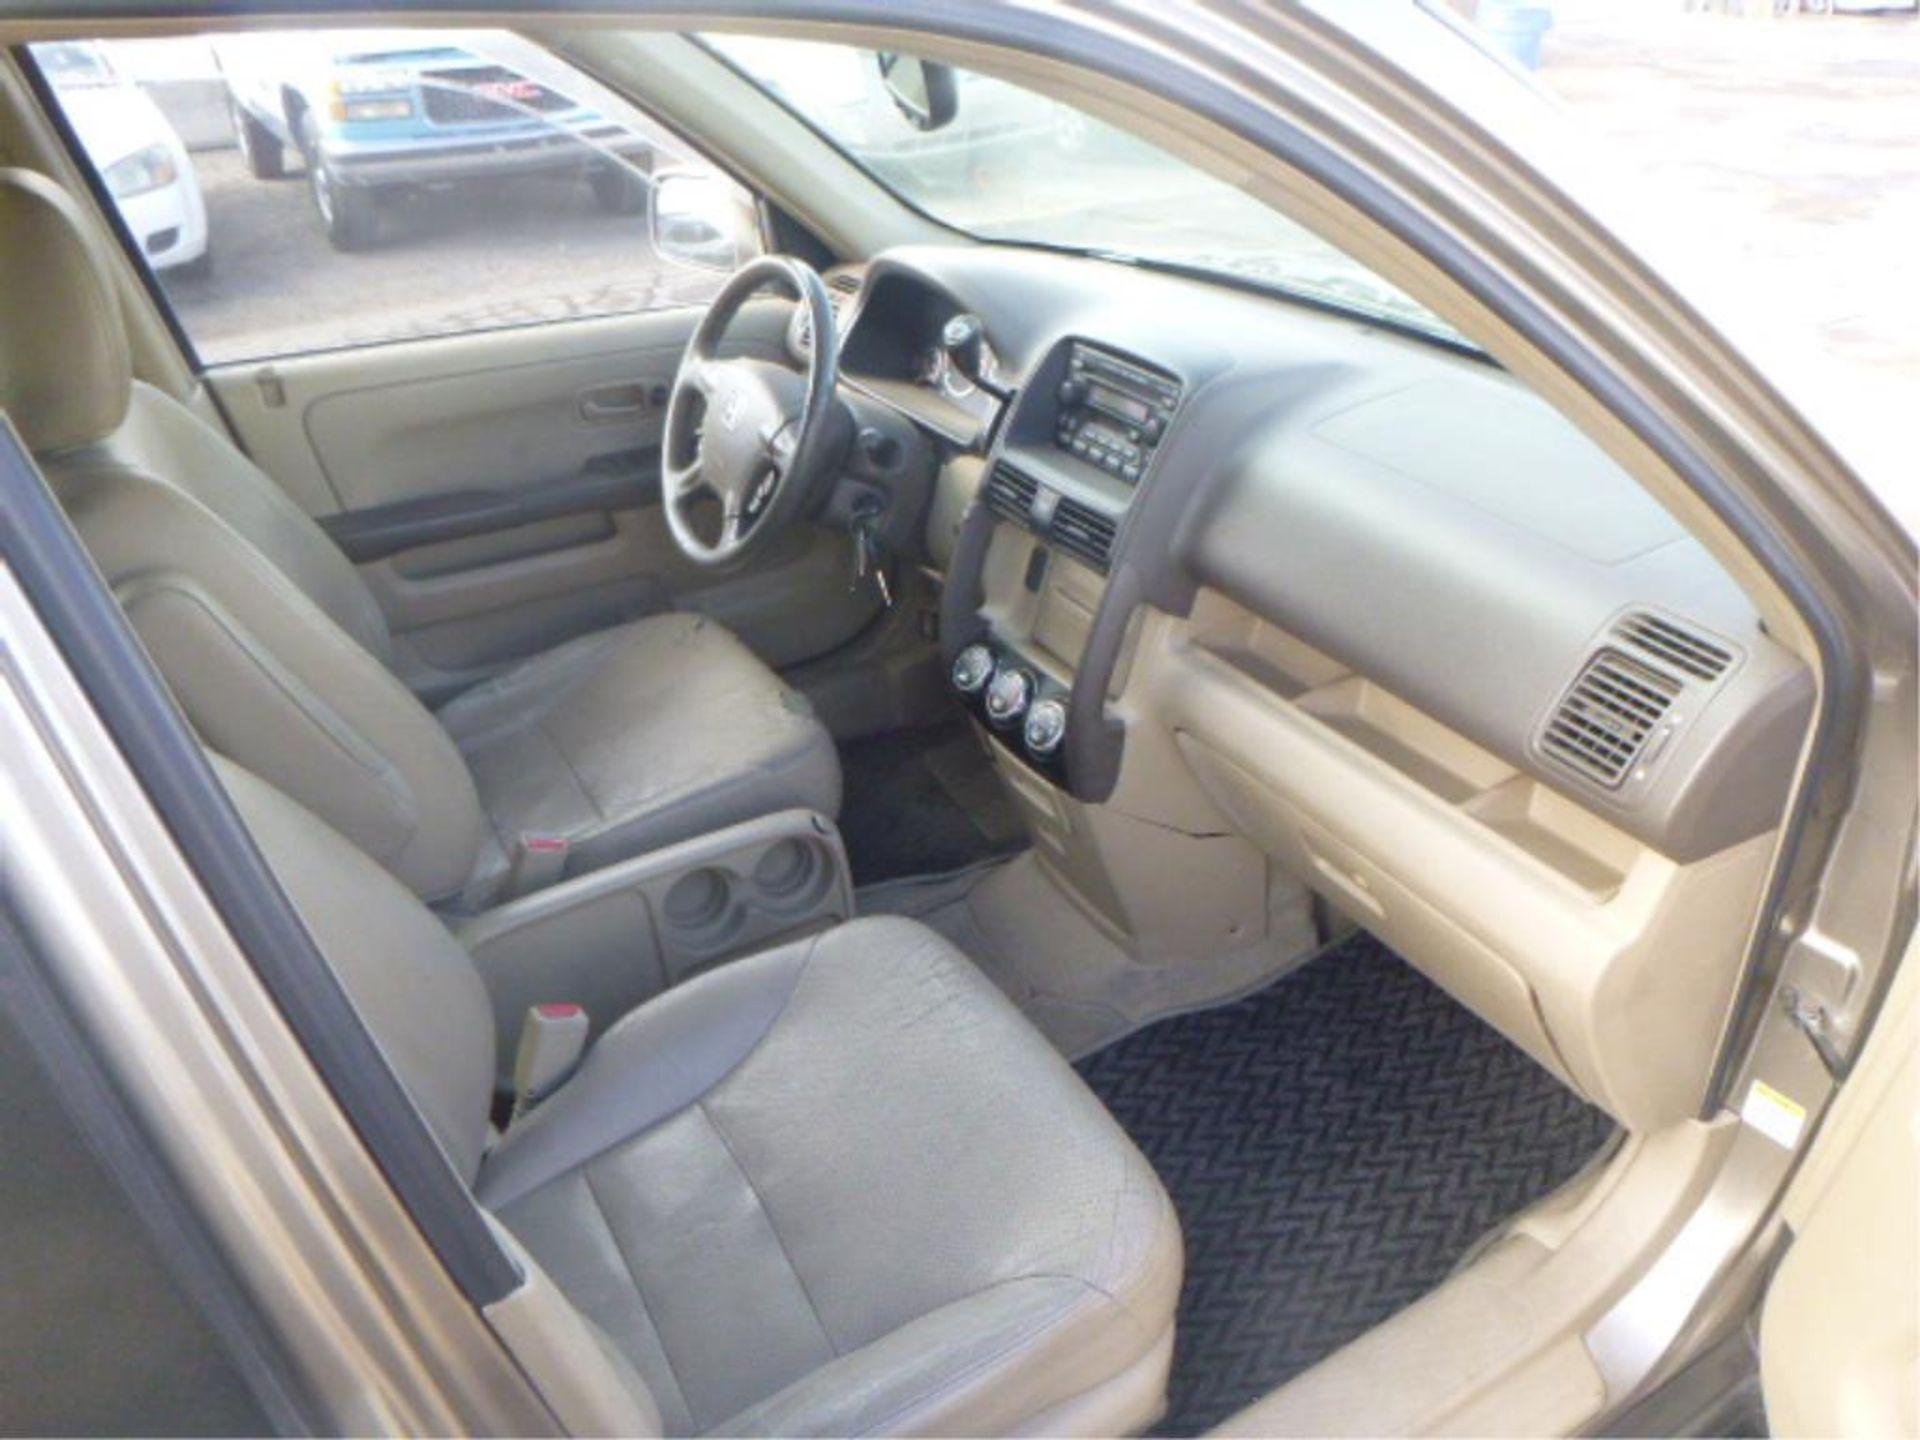 2005 Honda CR-V - Image 8 of 14